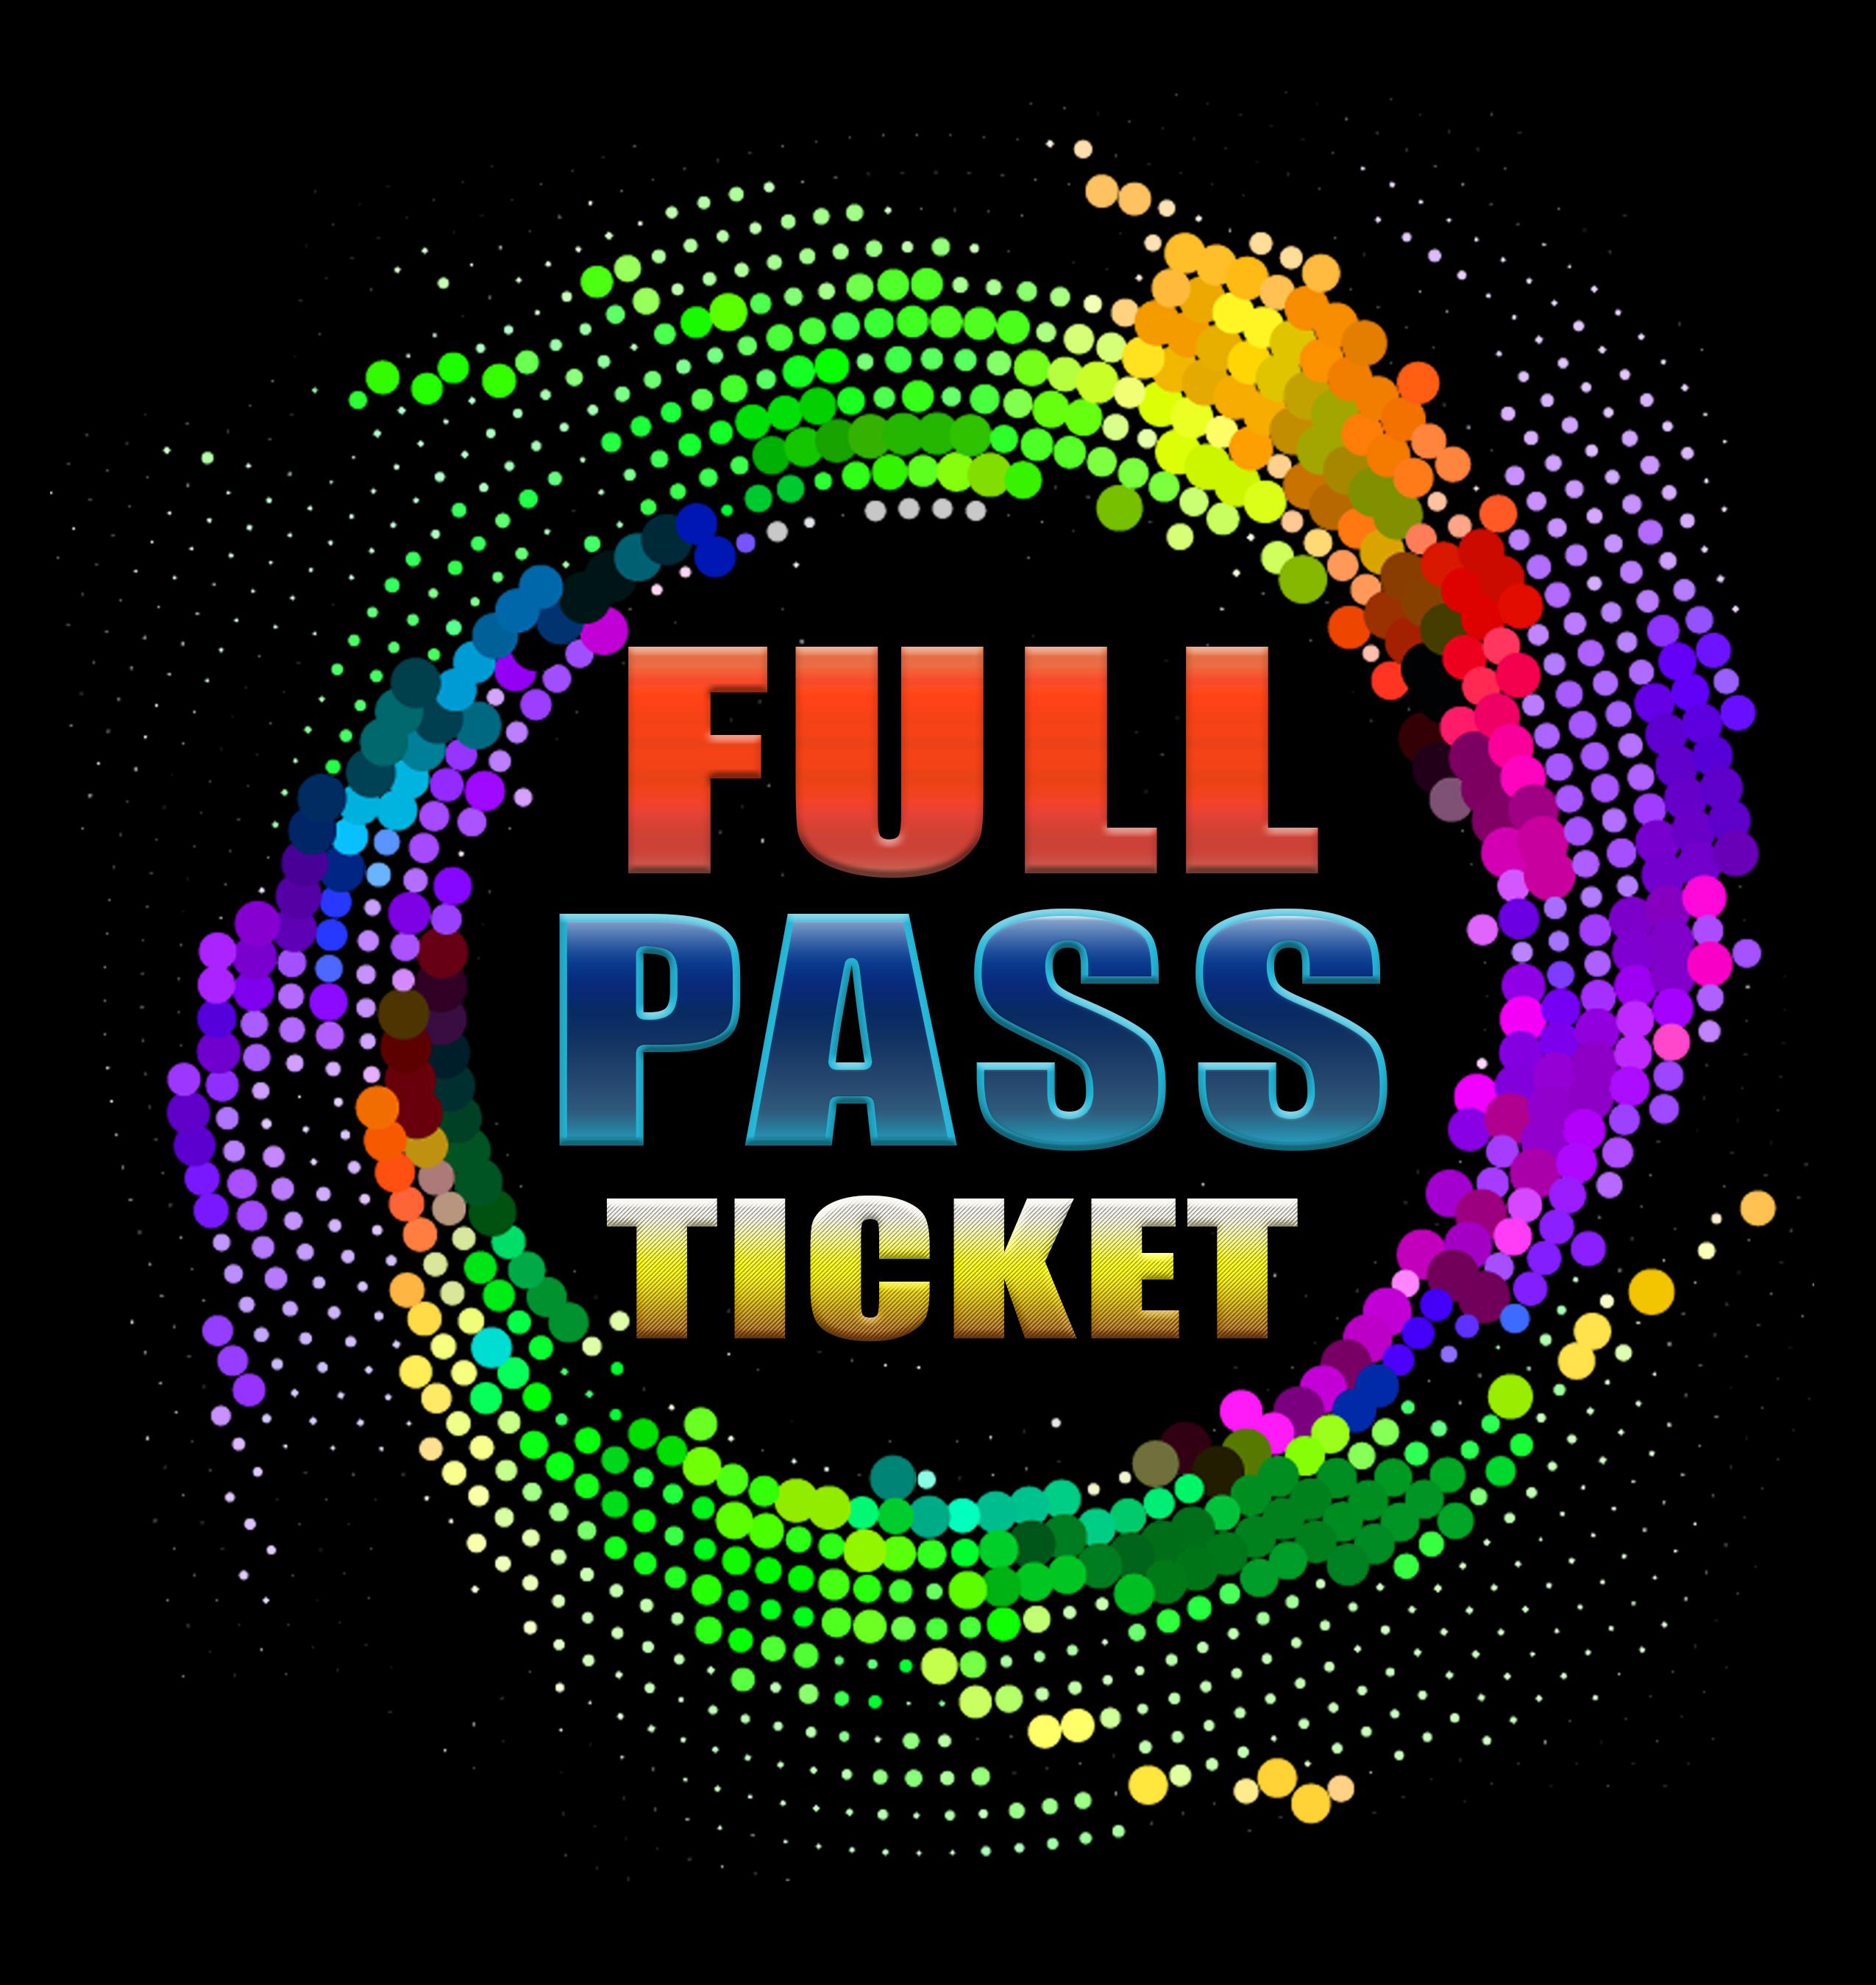 FULL PASS TICKET $119